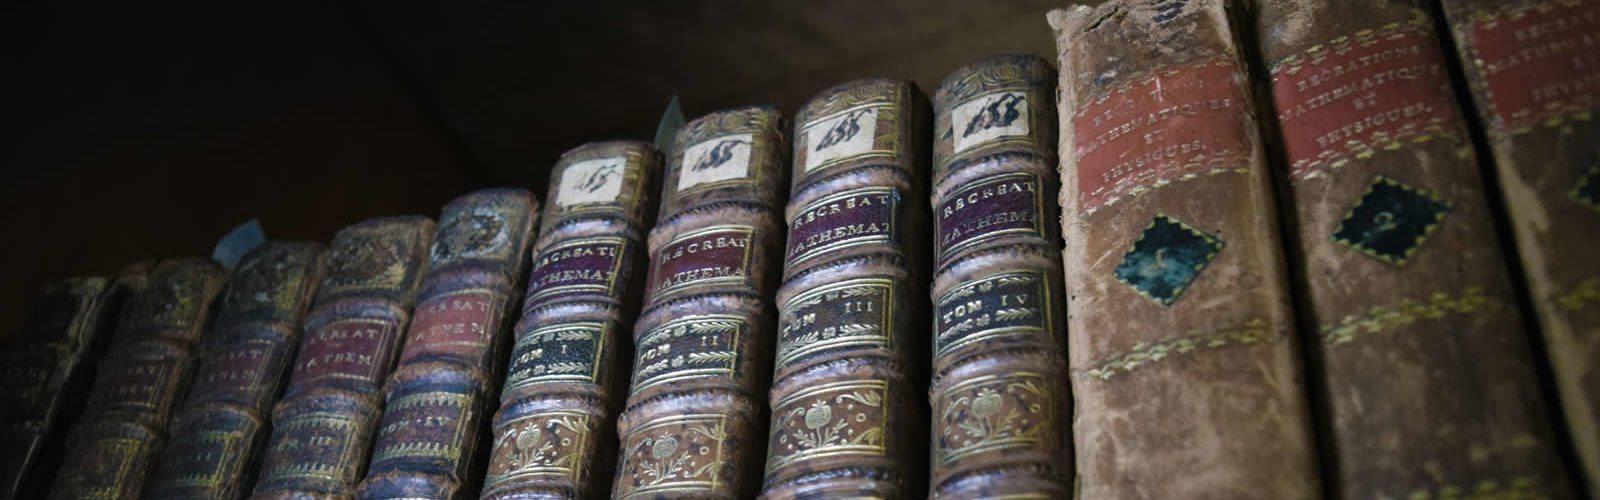 bibliotheques-secretes-insolites-livres-nyc-une